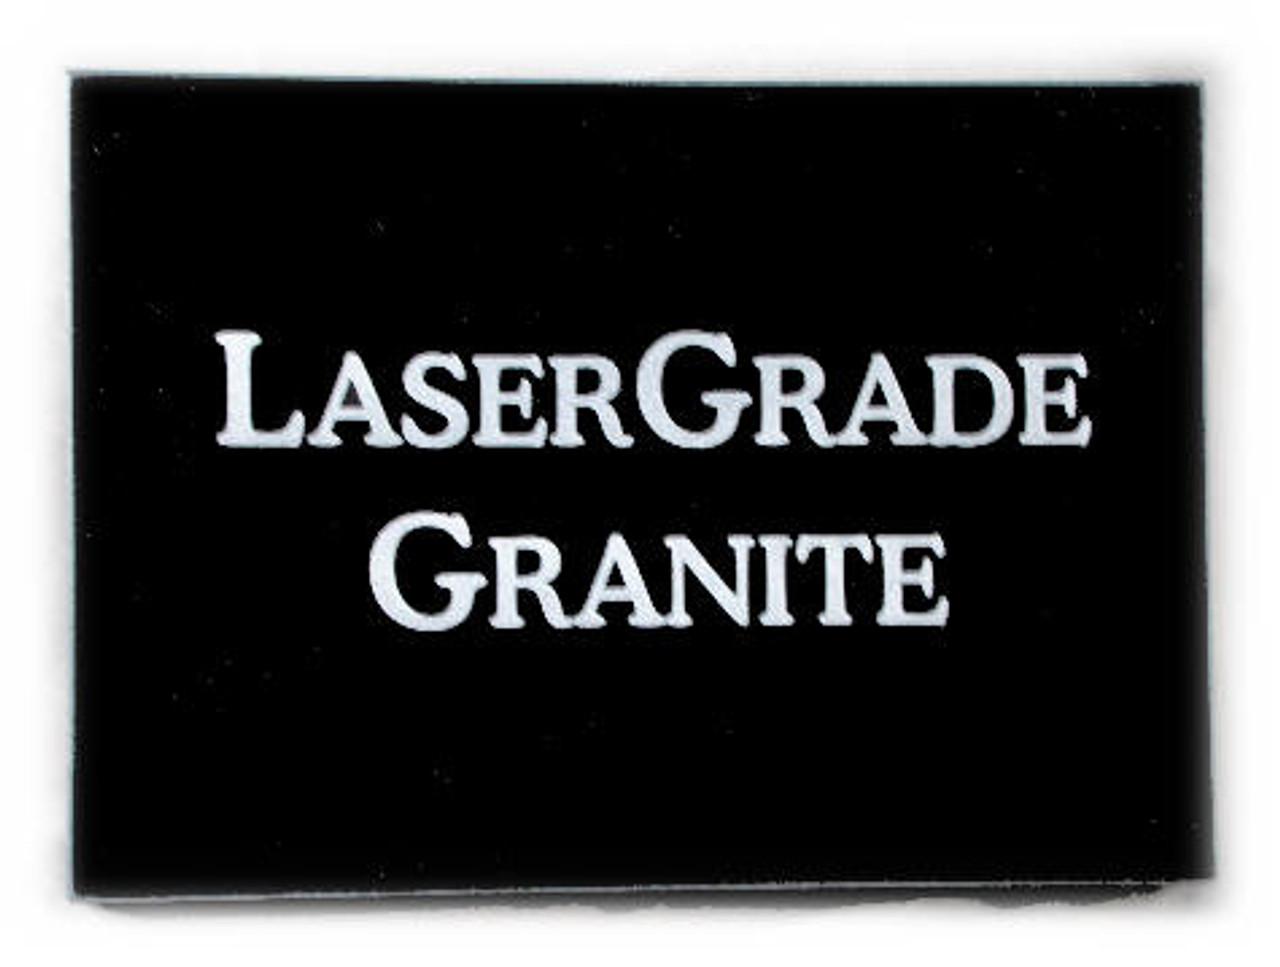 "G-MB-12x12EP, LaserGrade, MB Black Granite, 12"" x 12"" x 7-8mm"" , Edges Polished, (5 face polished)"